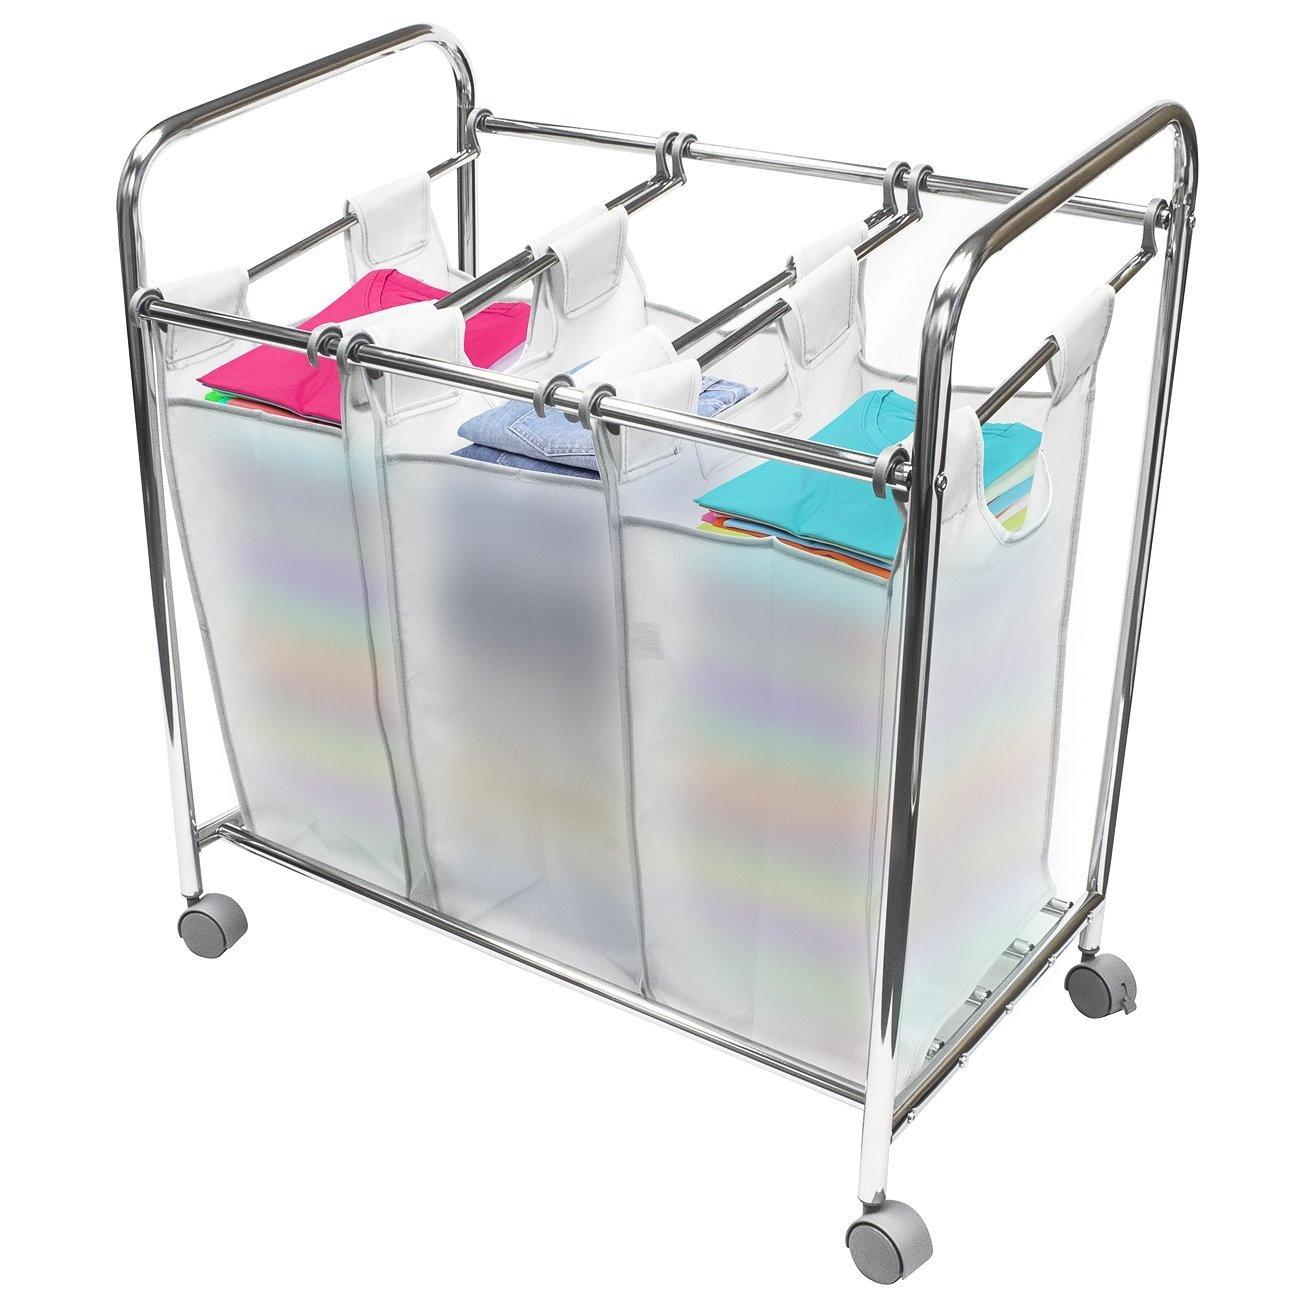 Sorbus Laundry Sorter Cart Basket Hamper On Wheels